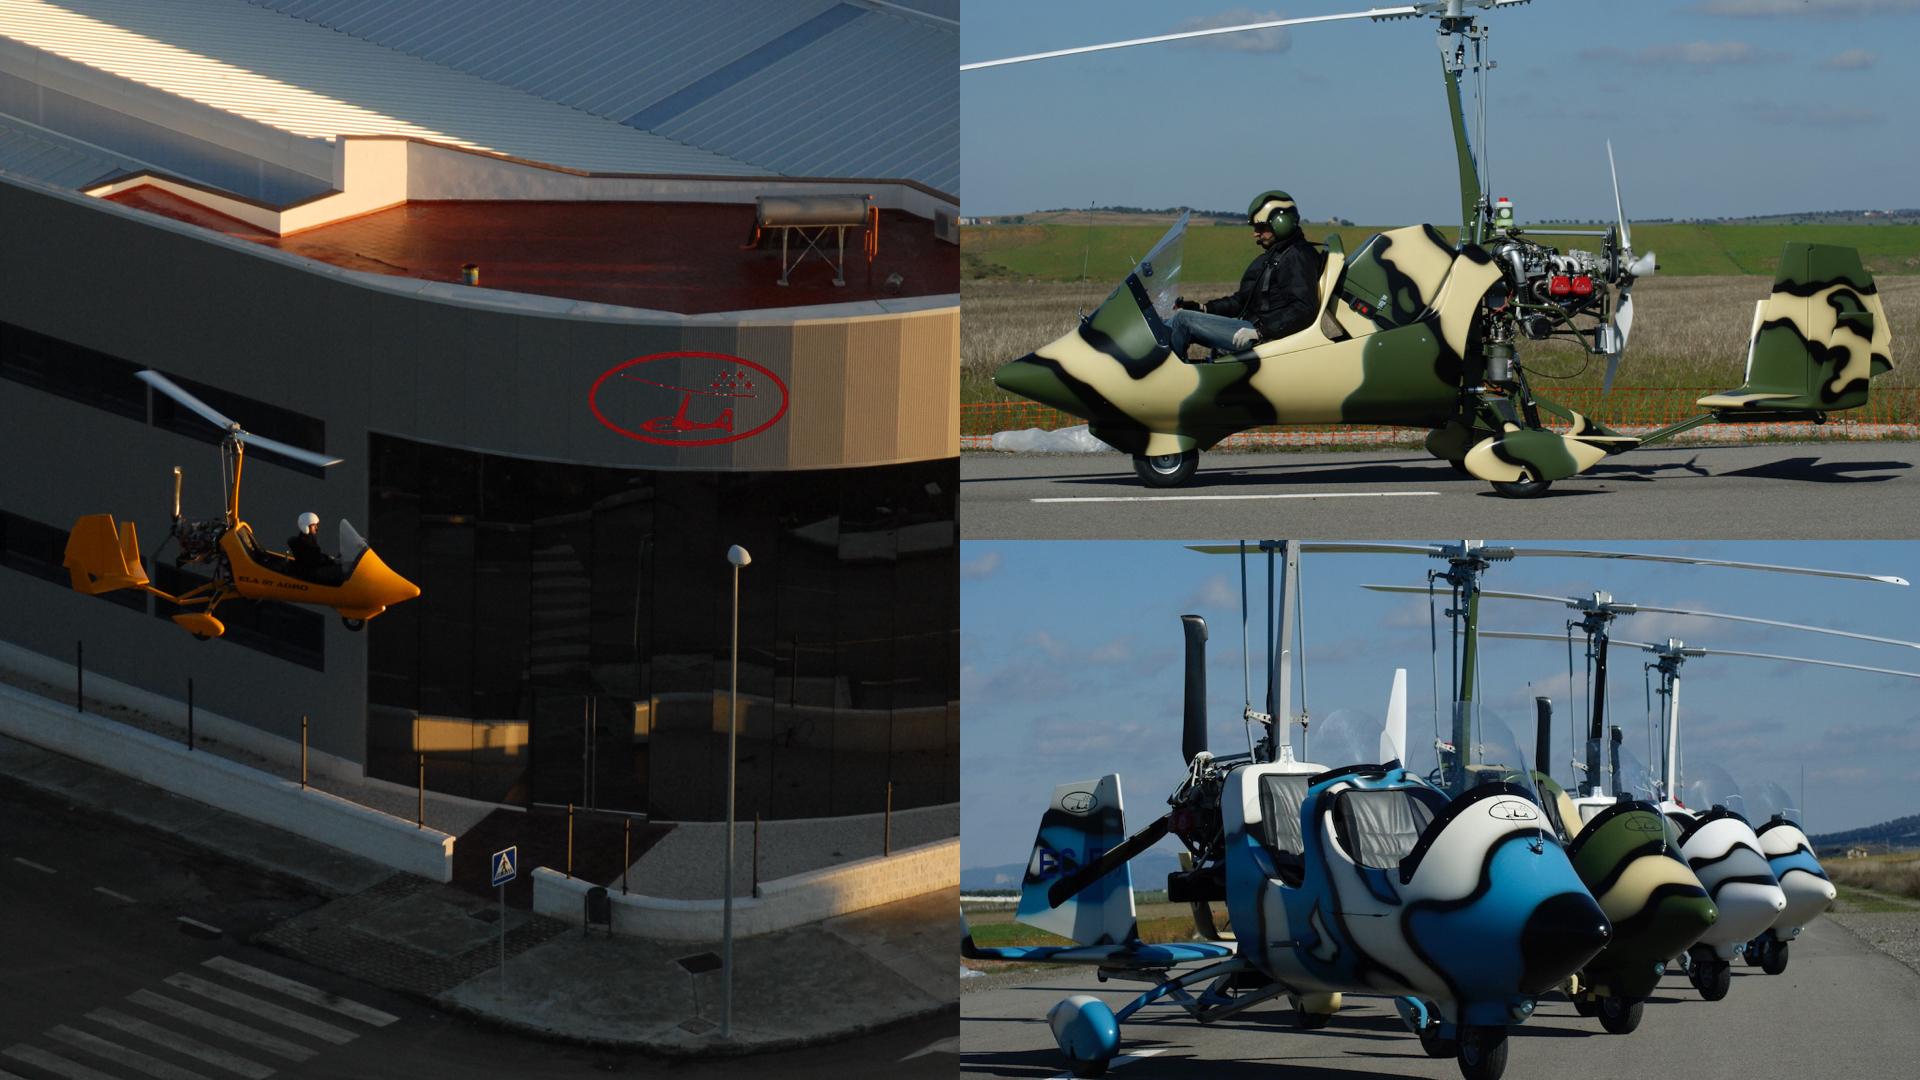 gyrocopter girodynamics ela aviacion factory camouflage